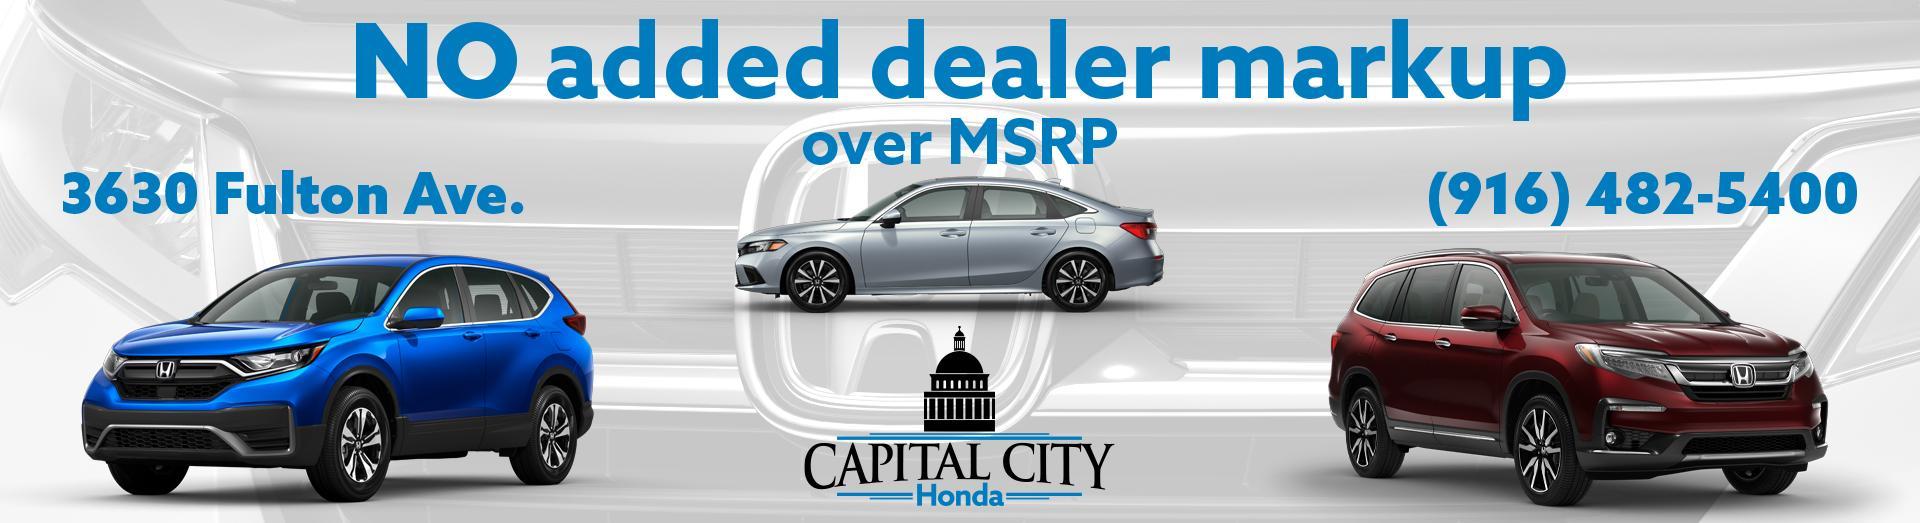 No Added Dealer Markup at Capital City Honda